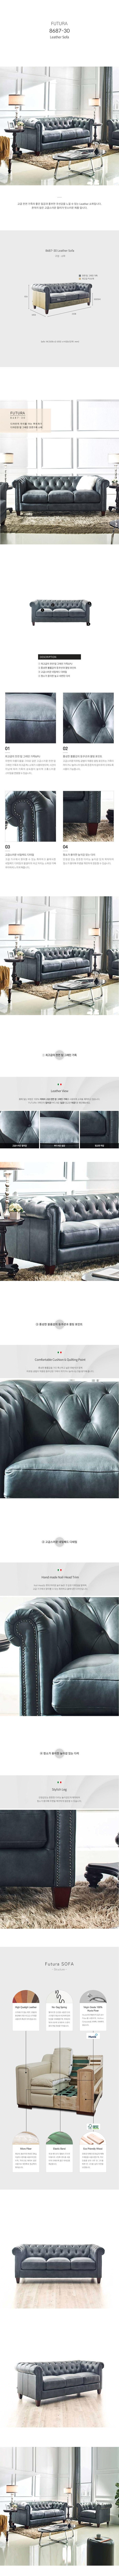 8687-30-Leather-sofa_190102_1.jpg